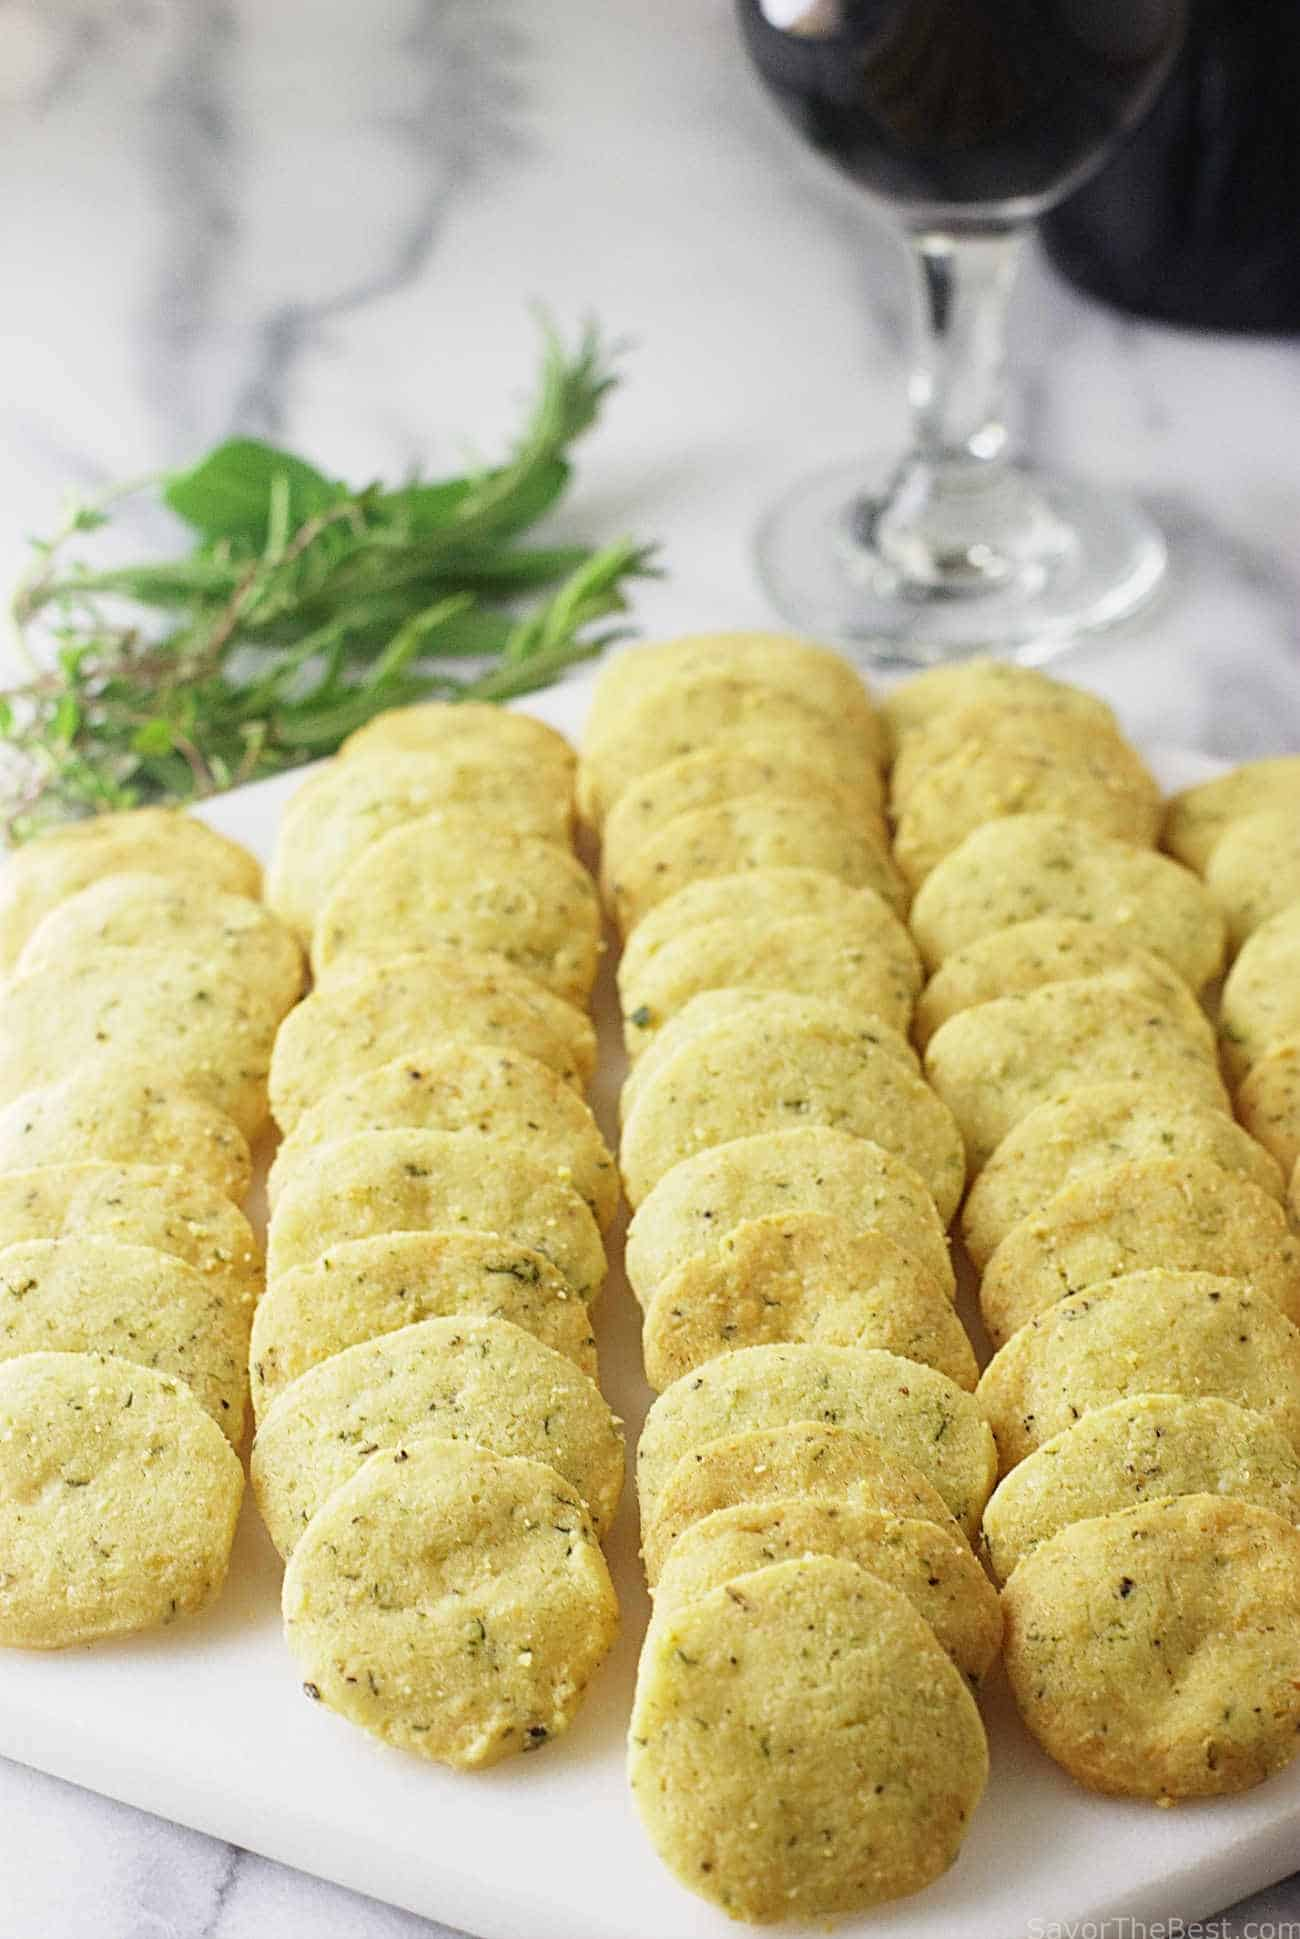 Barefoot Contessa Cocktail Party Einkorn Parmesan Herb Crackers Savor The Best